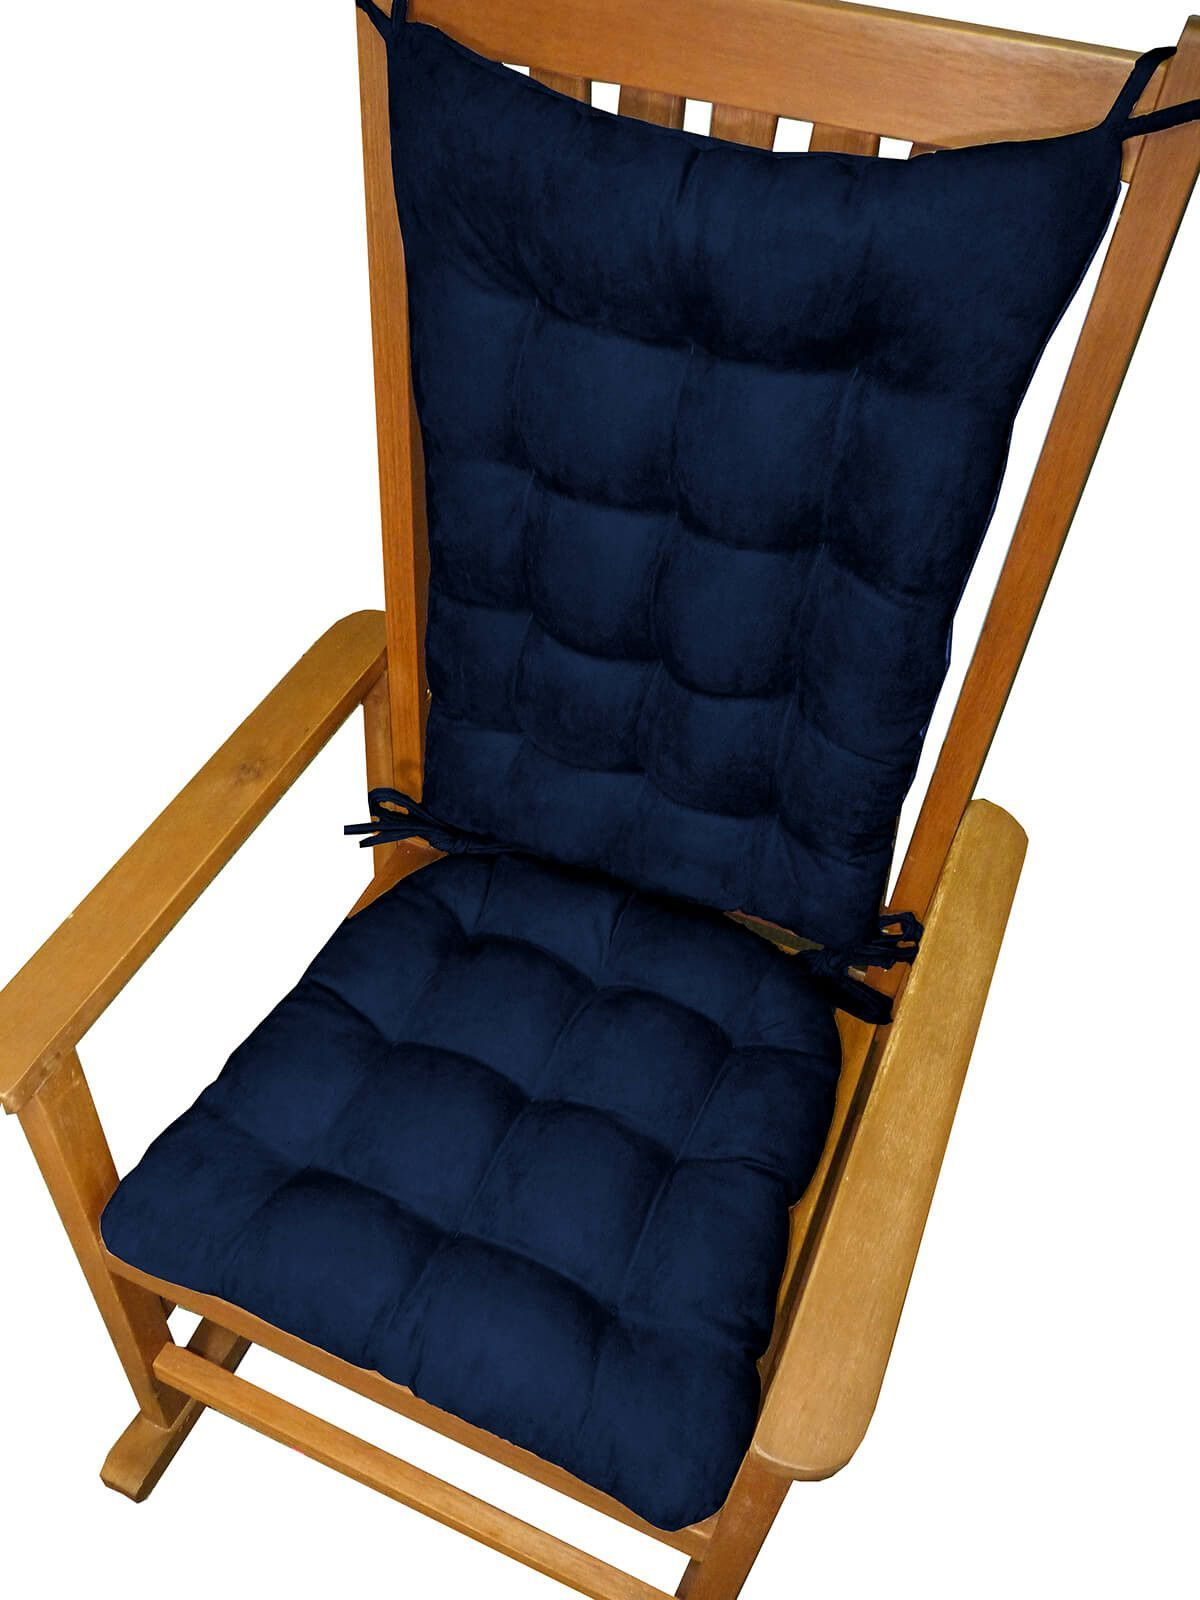 Phenomenal Micro Suede Royal Blue Rocking Chair Cushions Latex Foam Cjindustries Chair Design For Home Cjindustriesco